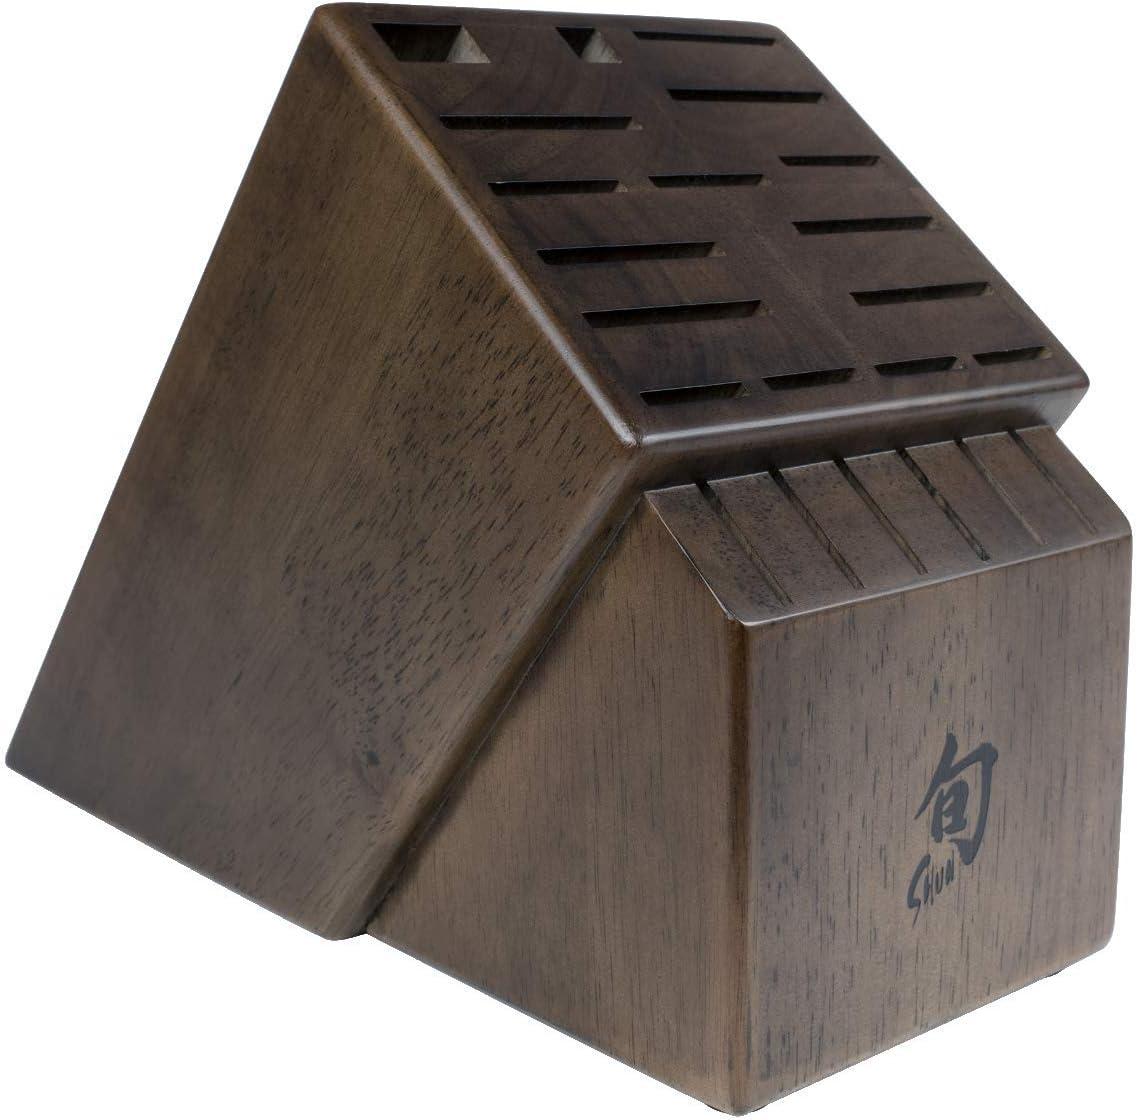 Shun 22 Slot Solid Wood Storage for Steak Knives Knife Block Set, Walnut